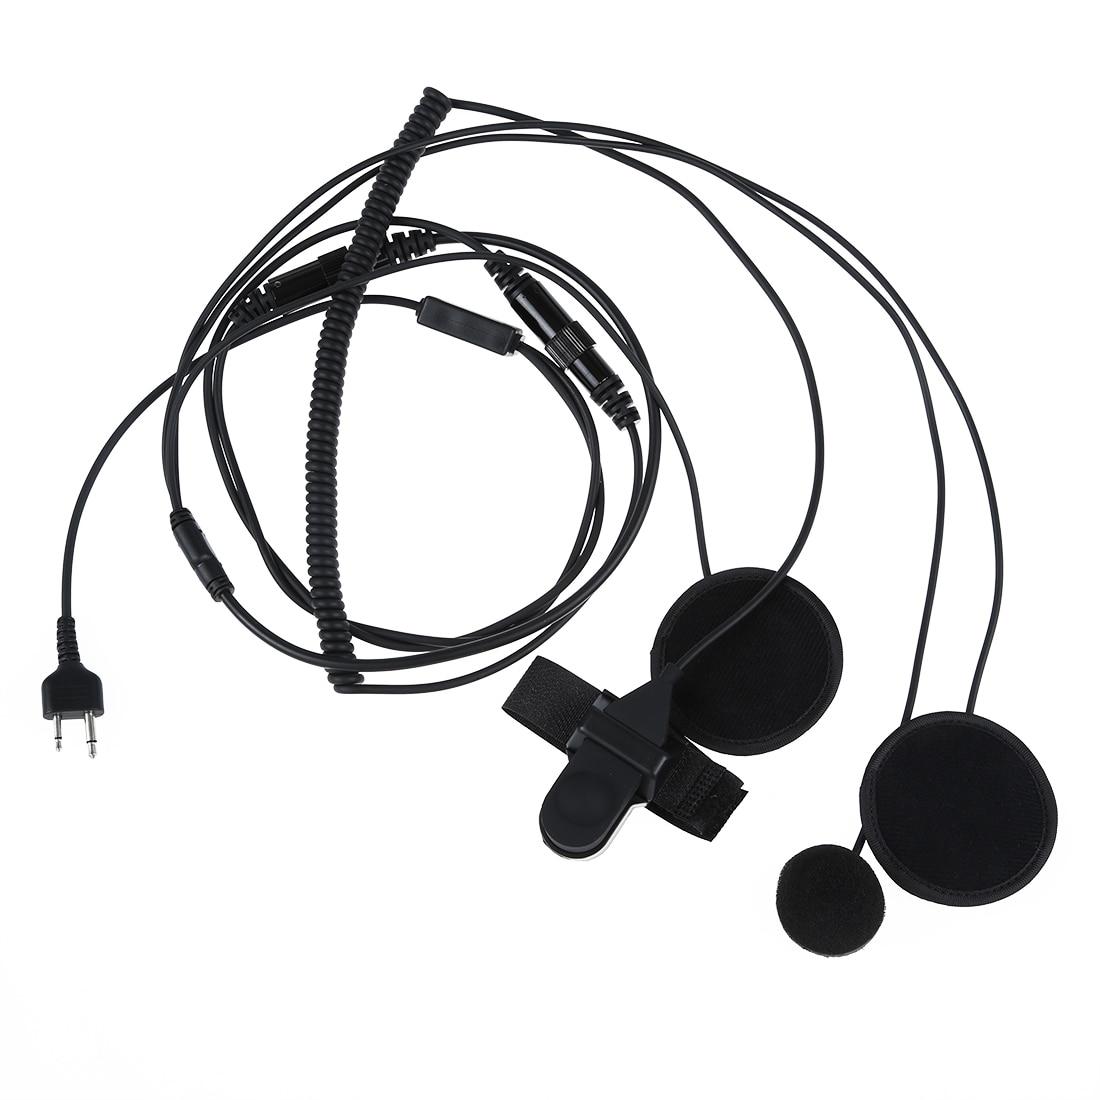 maxon microphone wiring diagram wiring library CB Radio Wiring scls 2 pin two way radios full face motorcycle moto bike helmet headset earphone microphone for